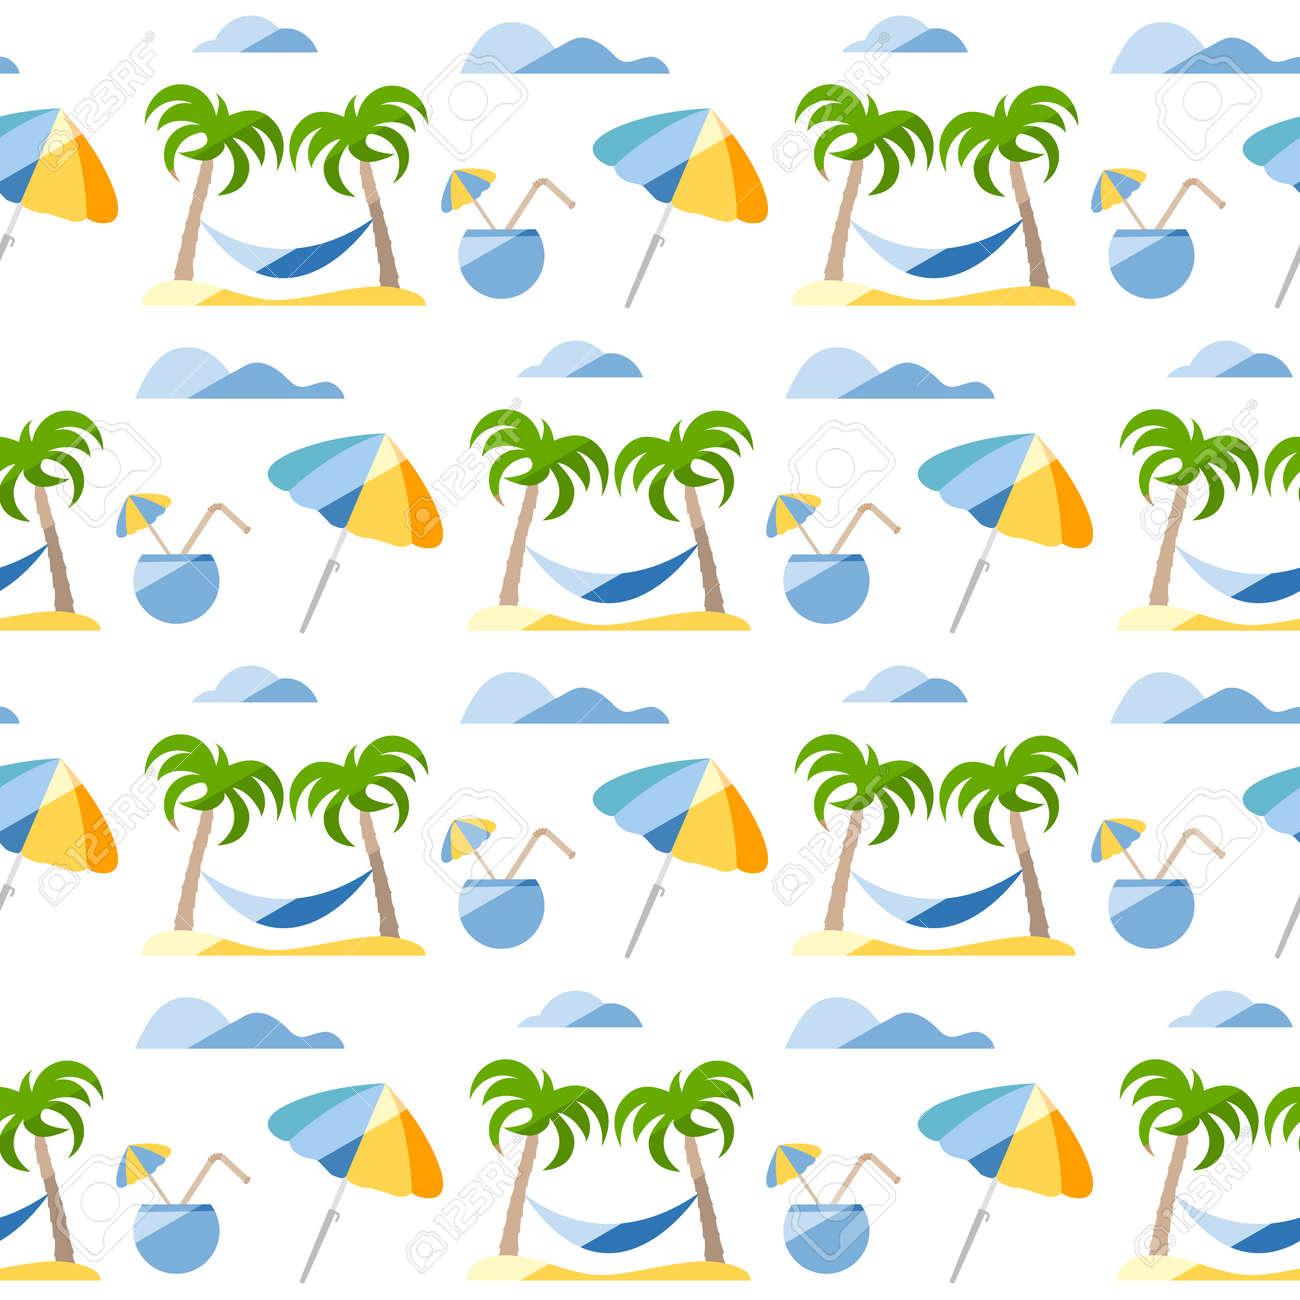 Seamless pattern. Travel vector illustration. Vacation at sea. Summer rest. Holiday. Adventure. Cruise. Cocktail, palm tree, hammock, beach umbrella. Design for print - 170255096